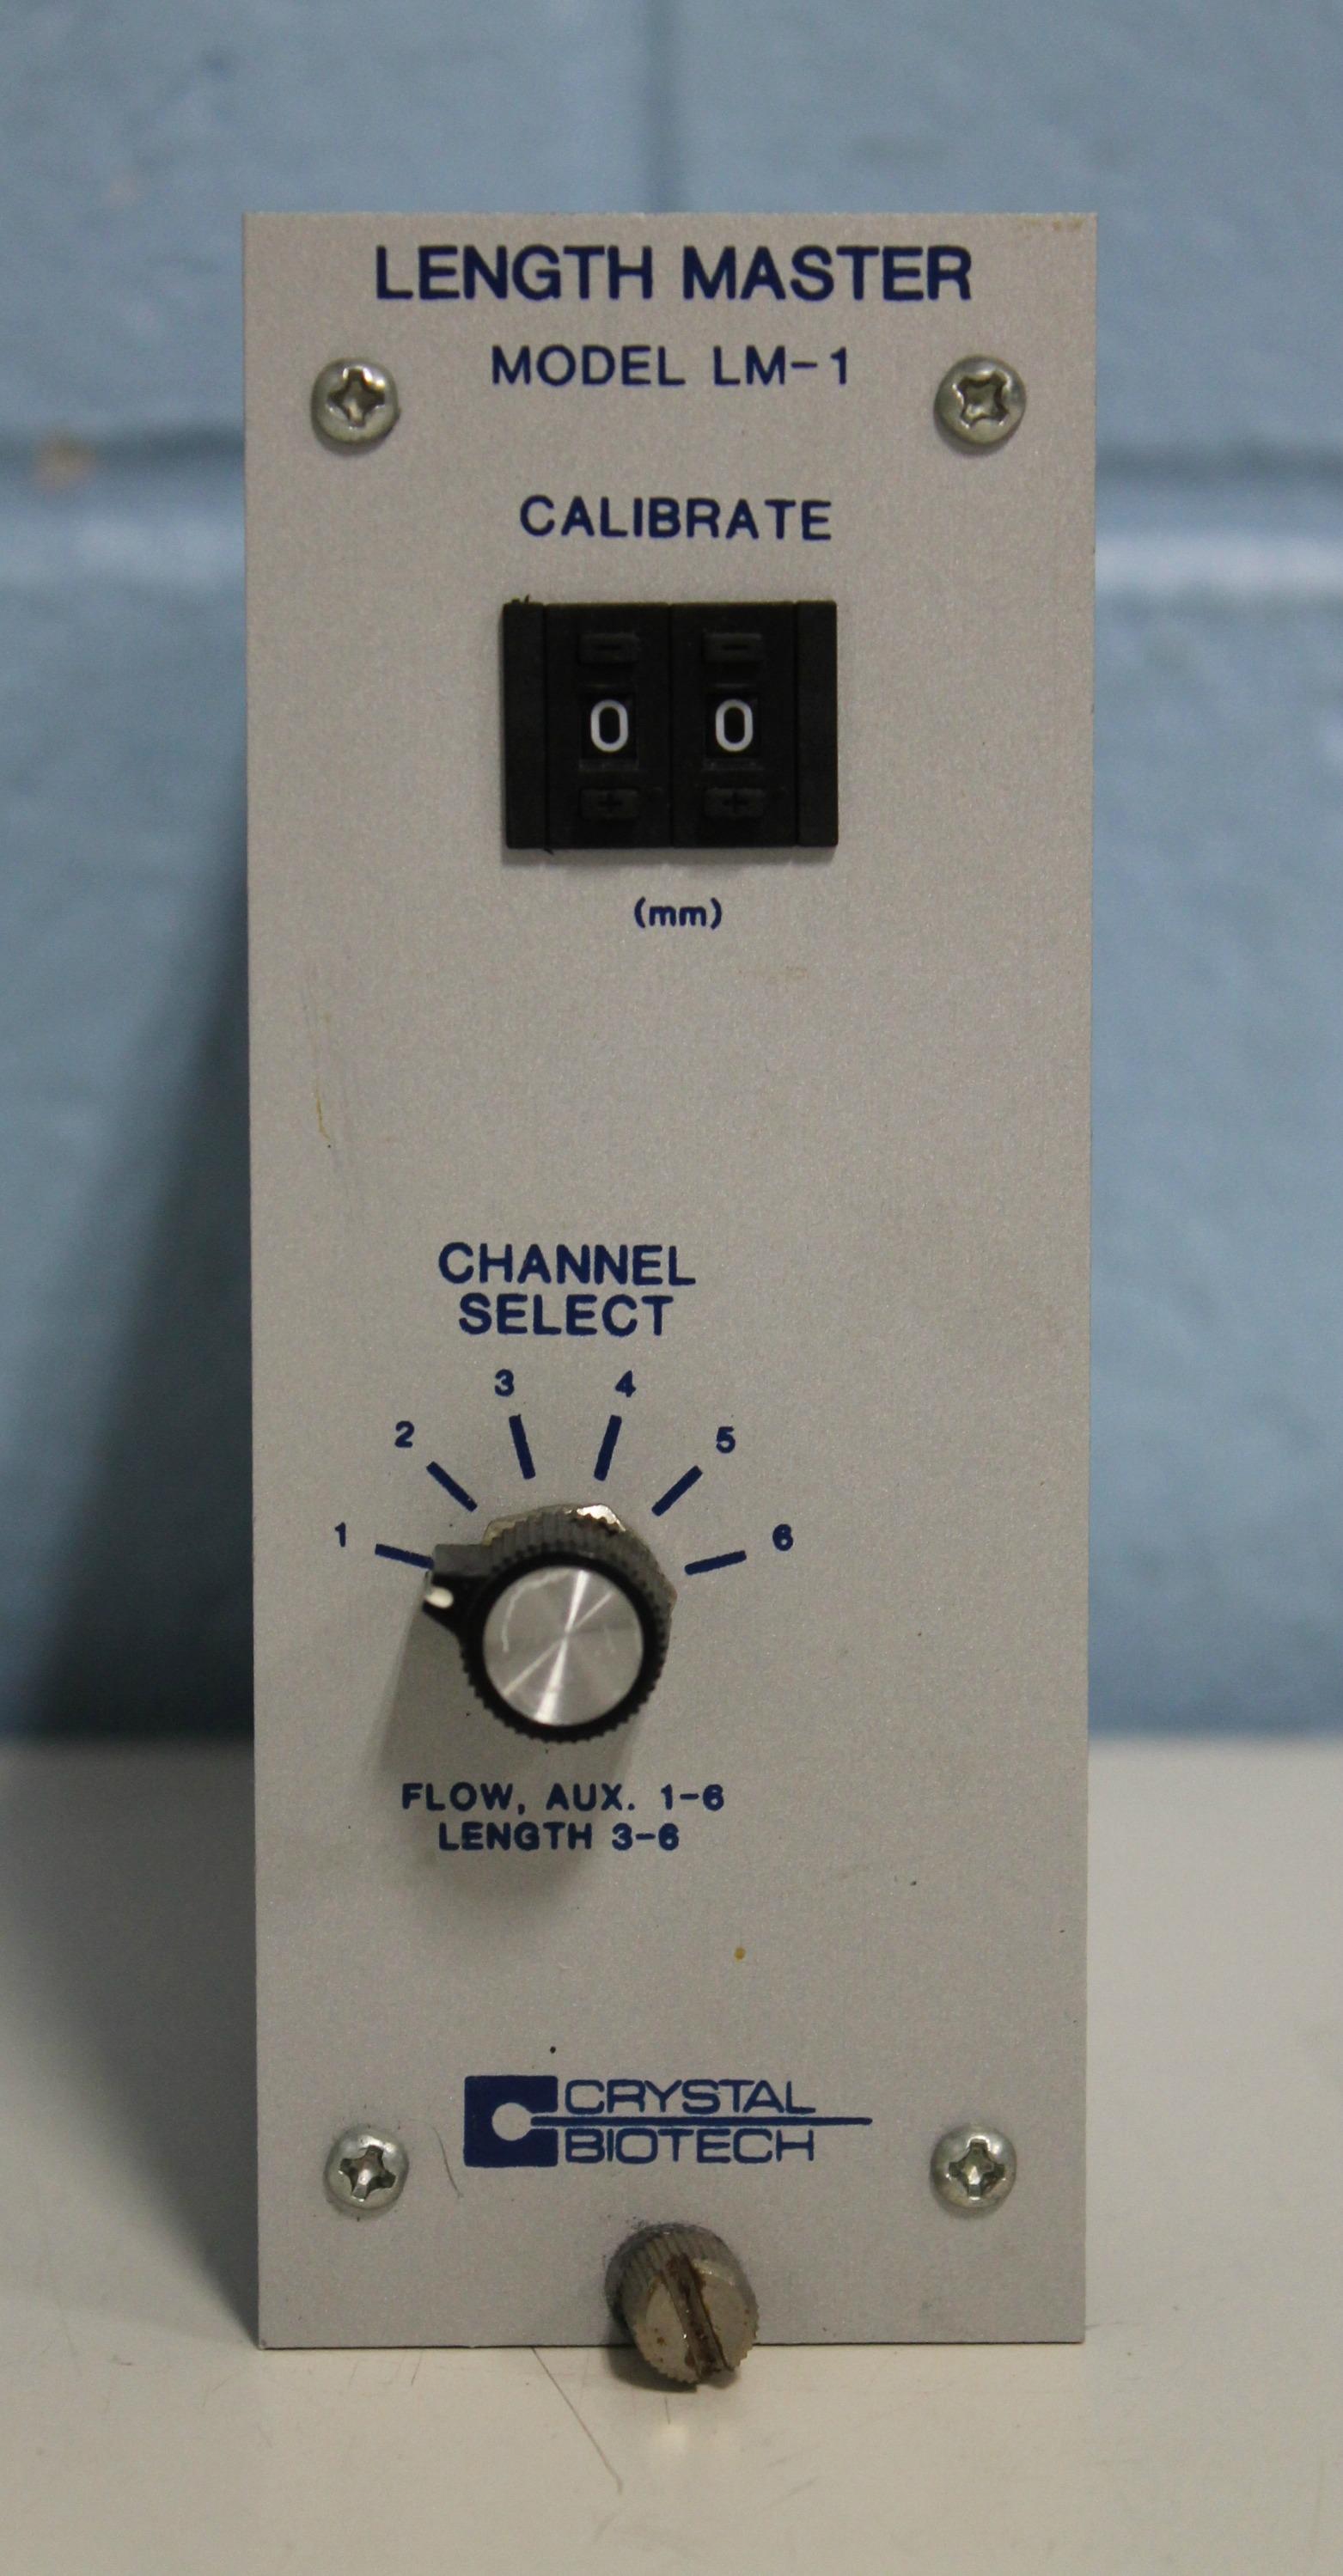 Crystal Biotech Length Master Model LM-1 Image